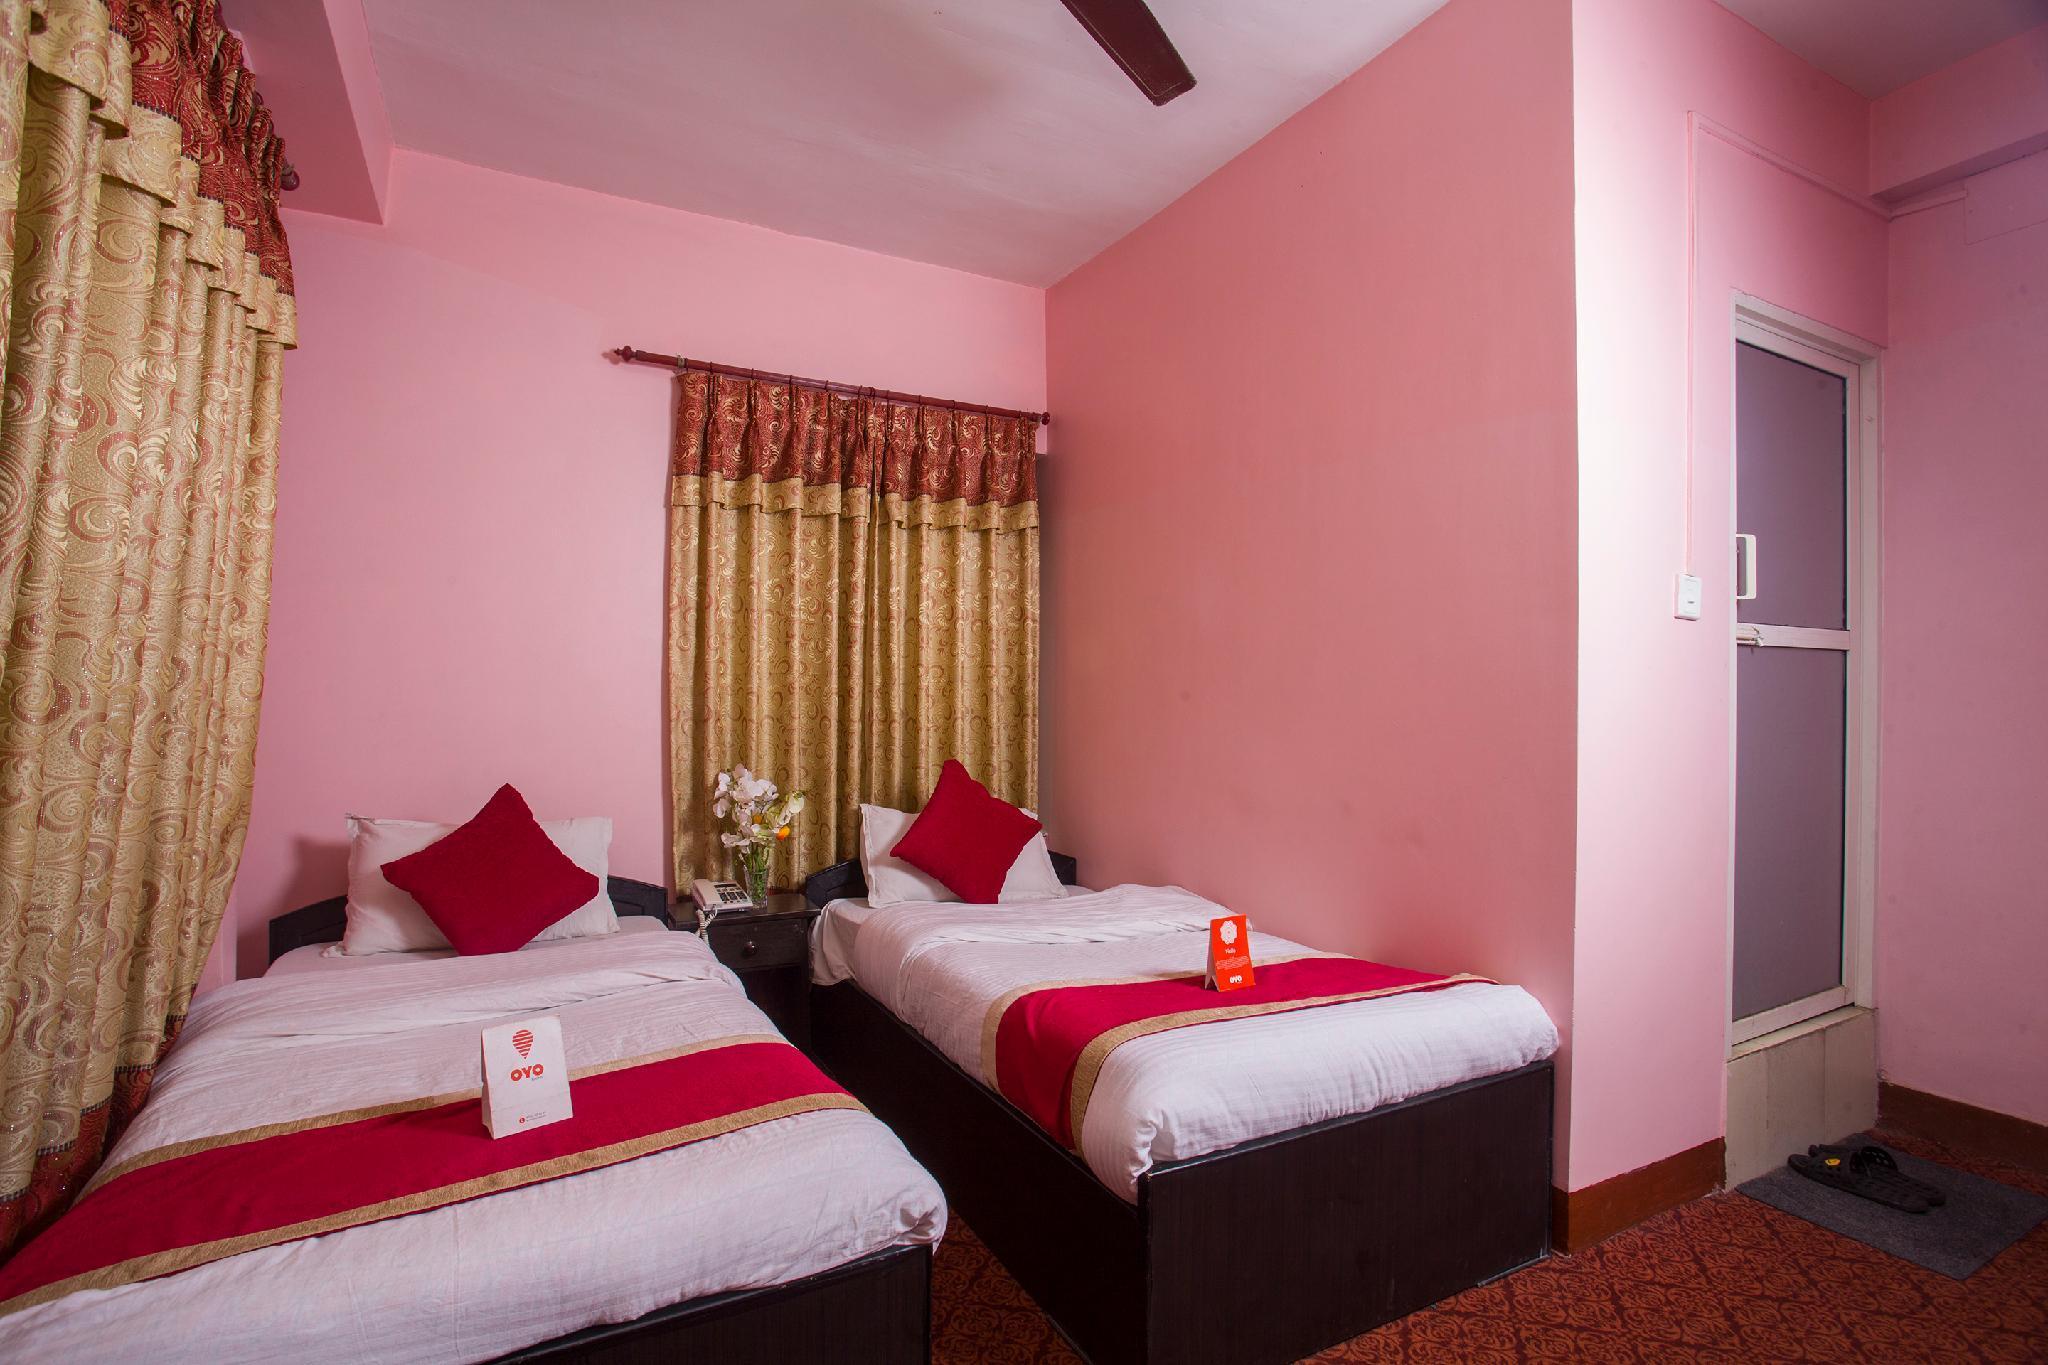 OYO 161 Ram Janaki Hotel